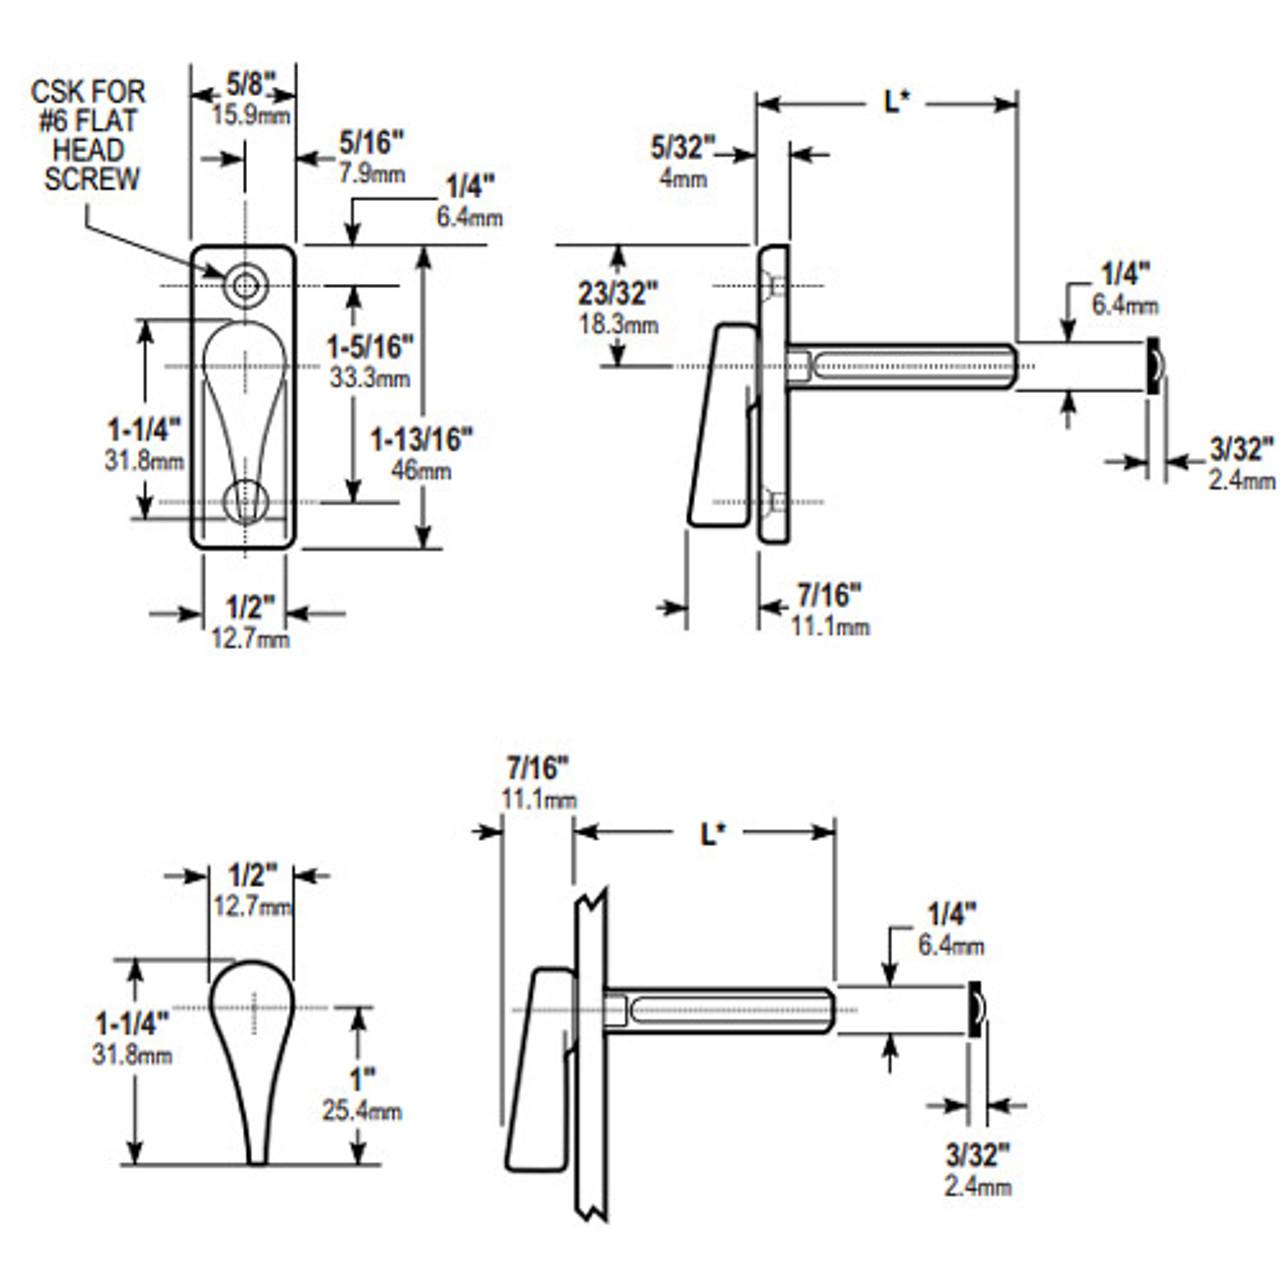 1000-21-30-121 Adams Rite 1000 Series Turns Dimensional View